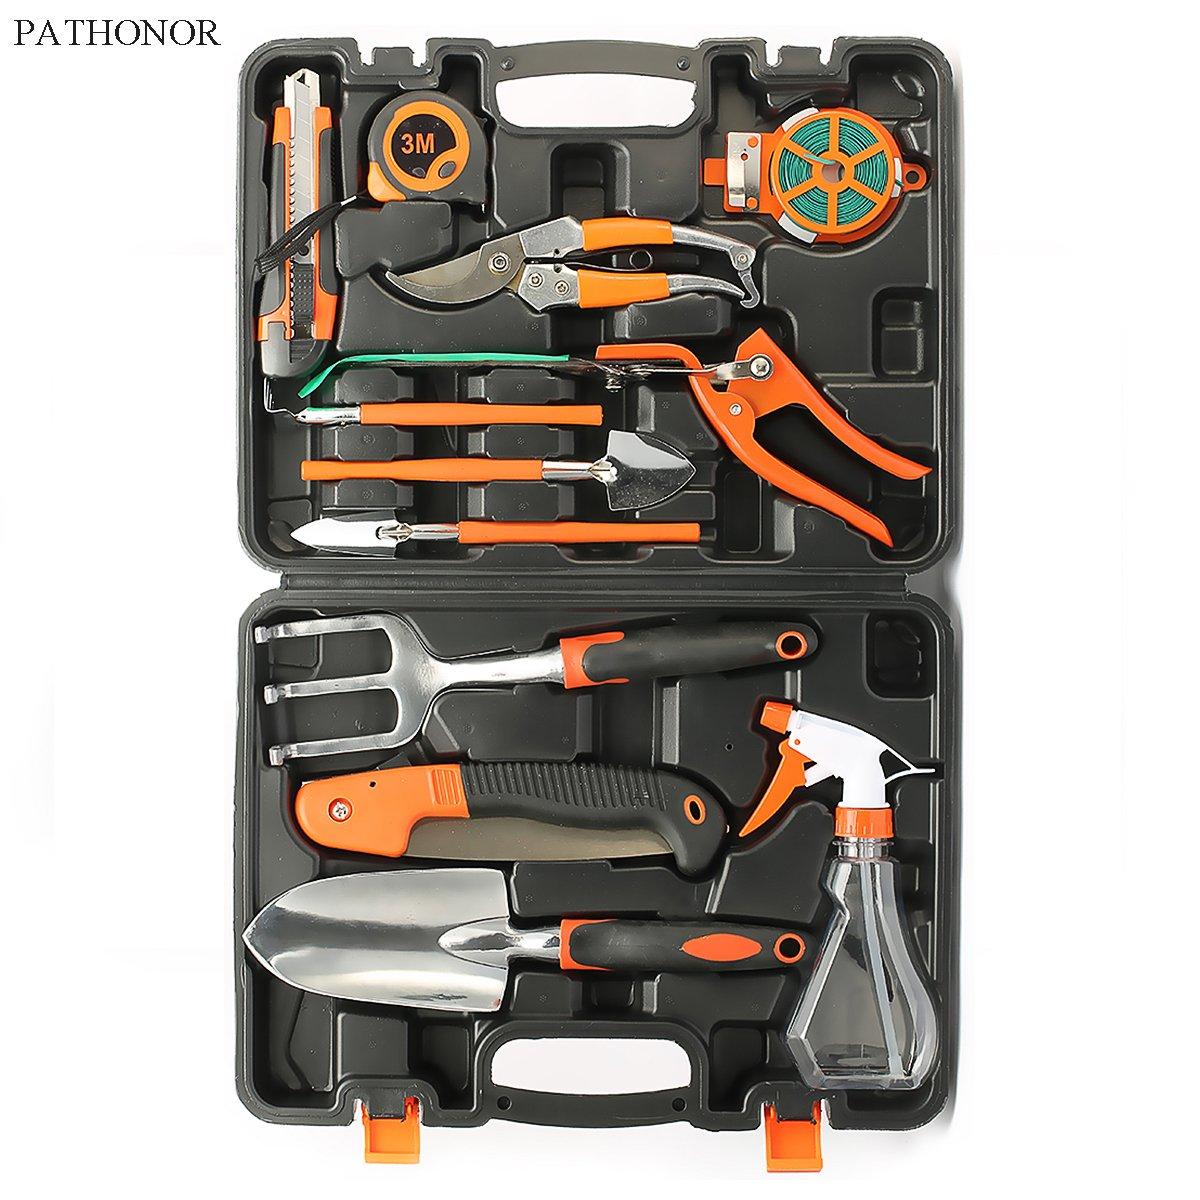 PATHONOR Garden Tool Set, 12 Piece Garden Heavy Duty Tools Set Kit with Hard Storage Case, Secateurs, Pruning Saw, Trowel Pruners, Rakes - Garden Gifts for Men & Women